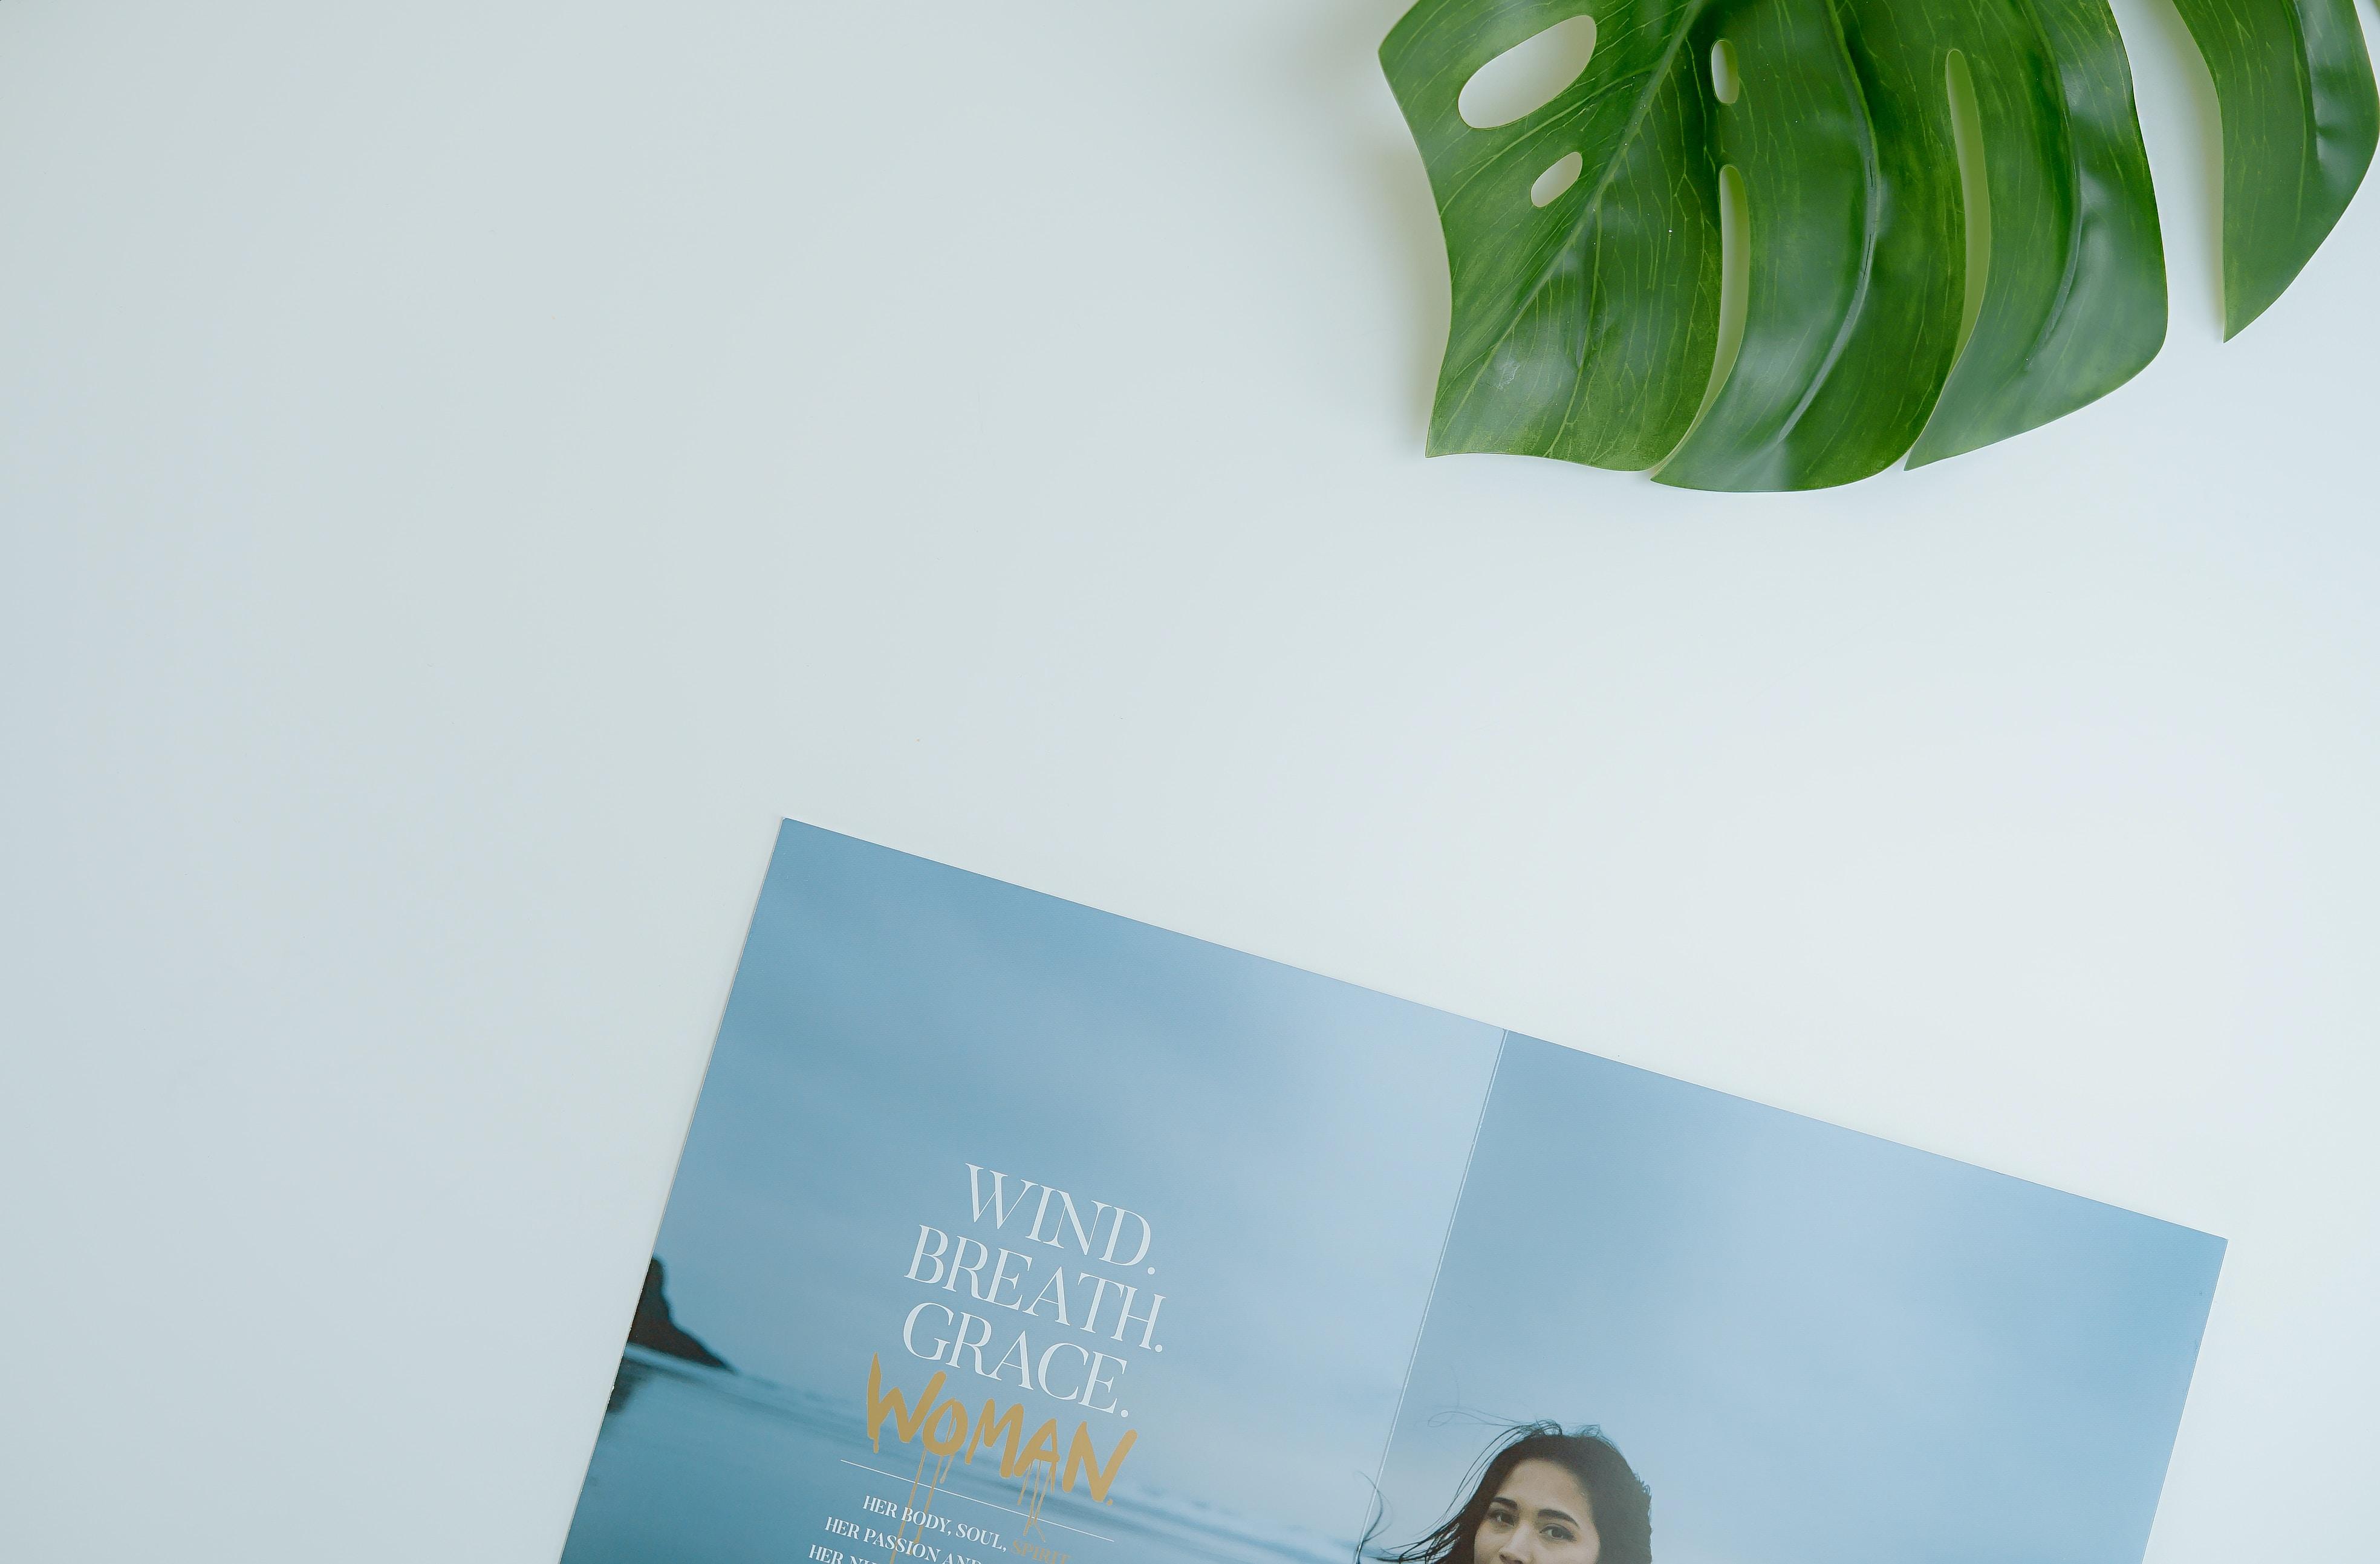 green Swiss cheese leaf beside open magazine on white platform